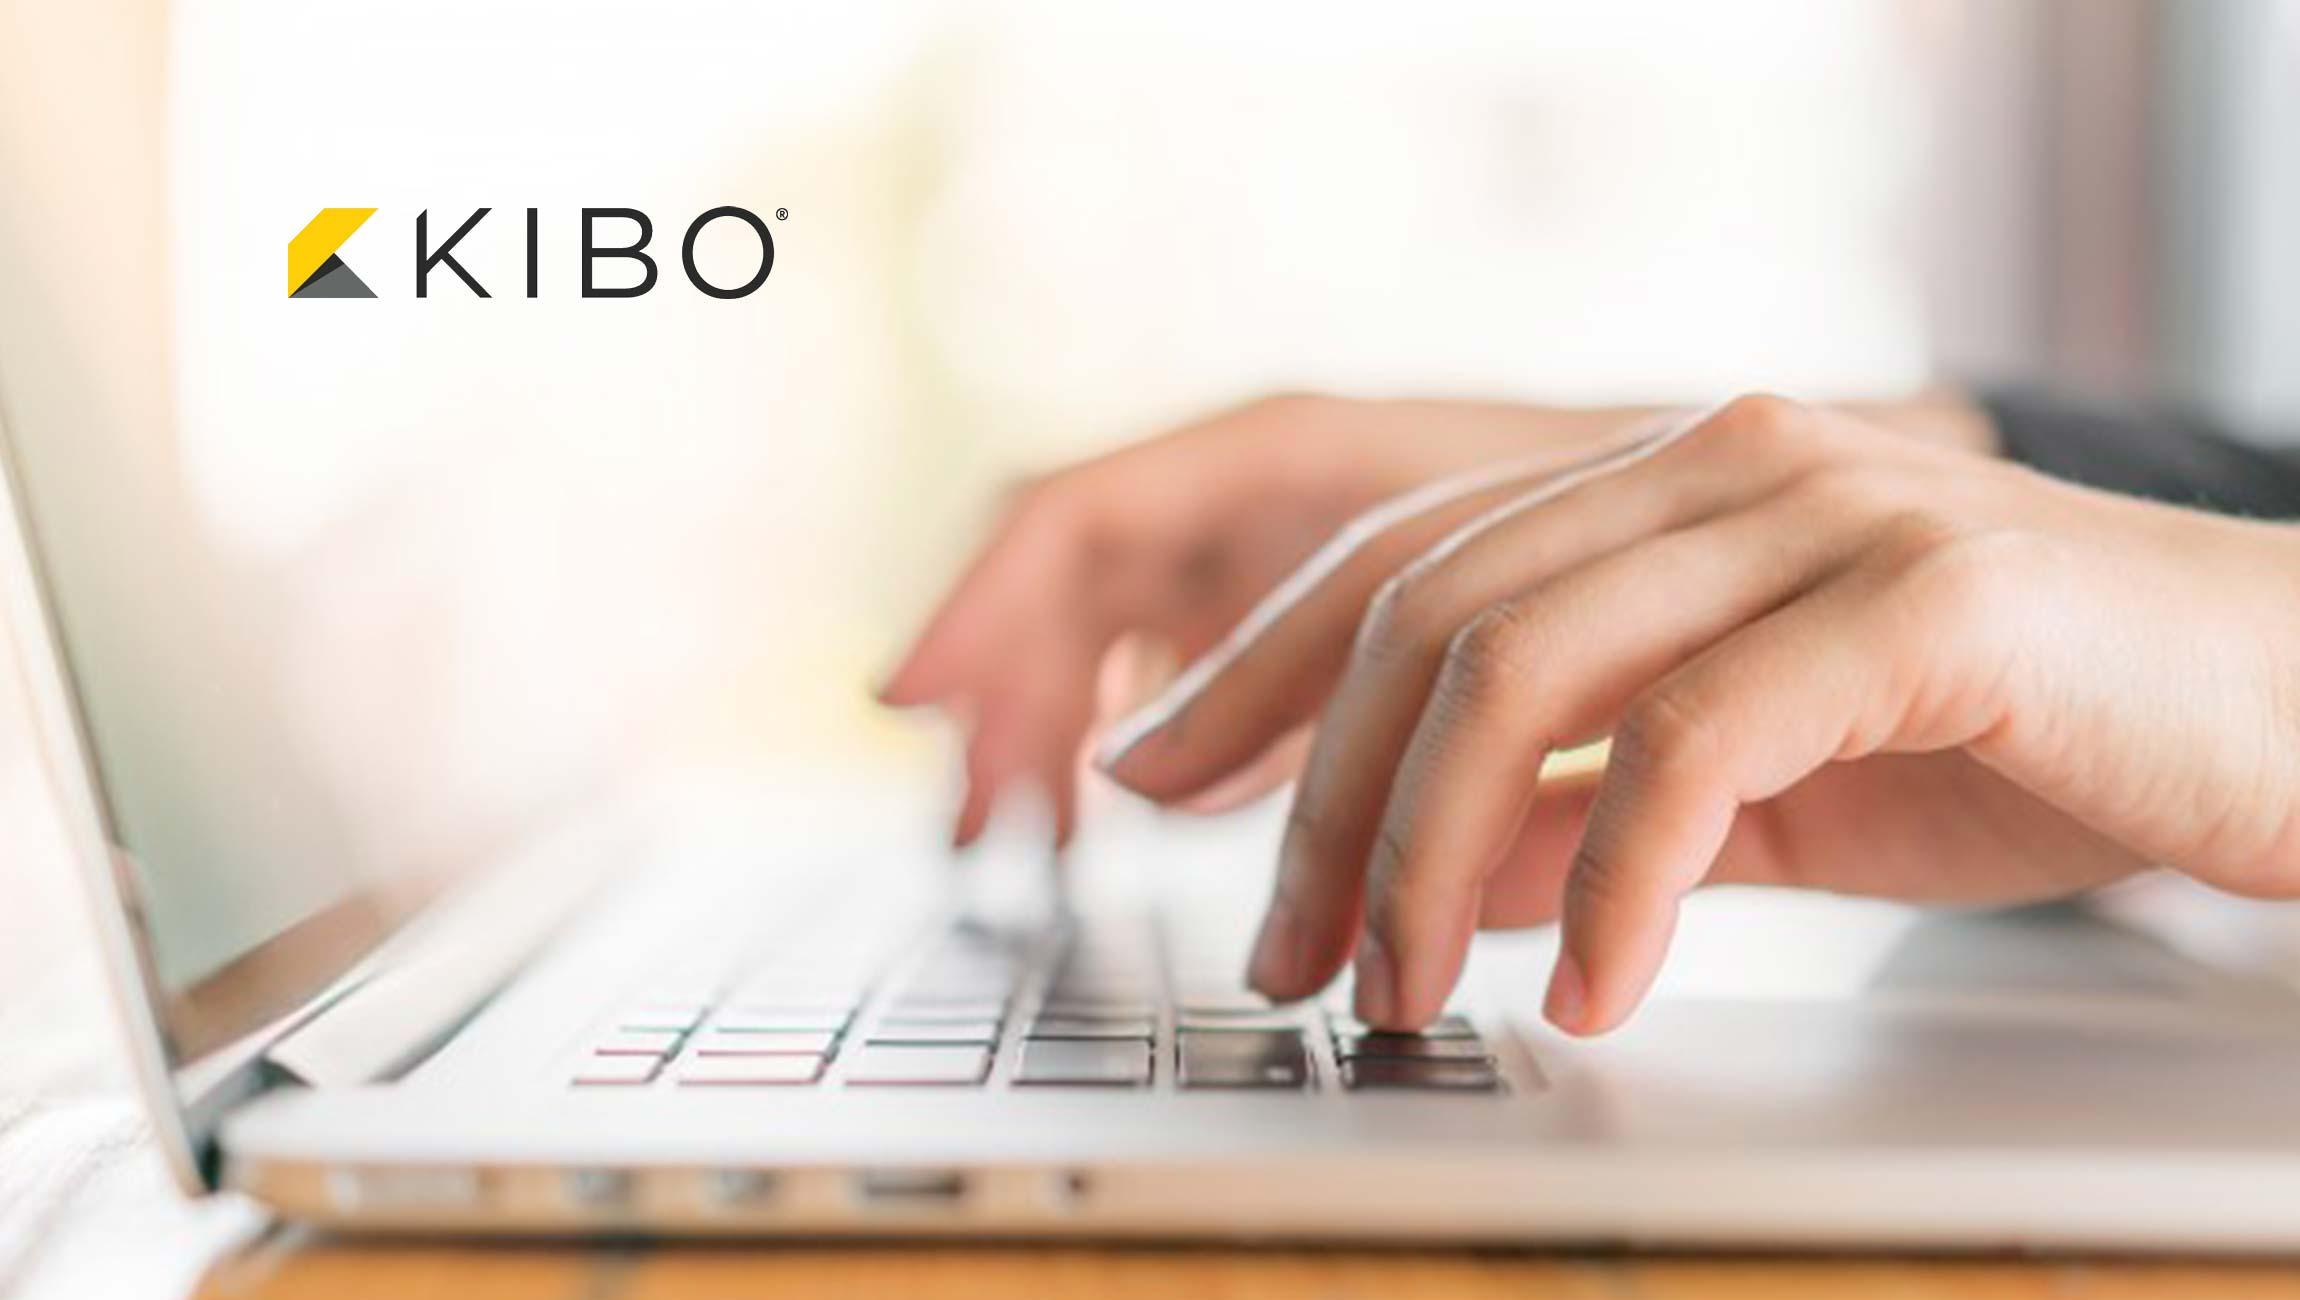 Kibo's Certona and Monetate Both Named as Leaders in 2020 Gartner Magic Quadrant for Personalization Engines